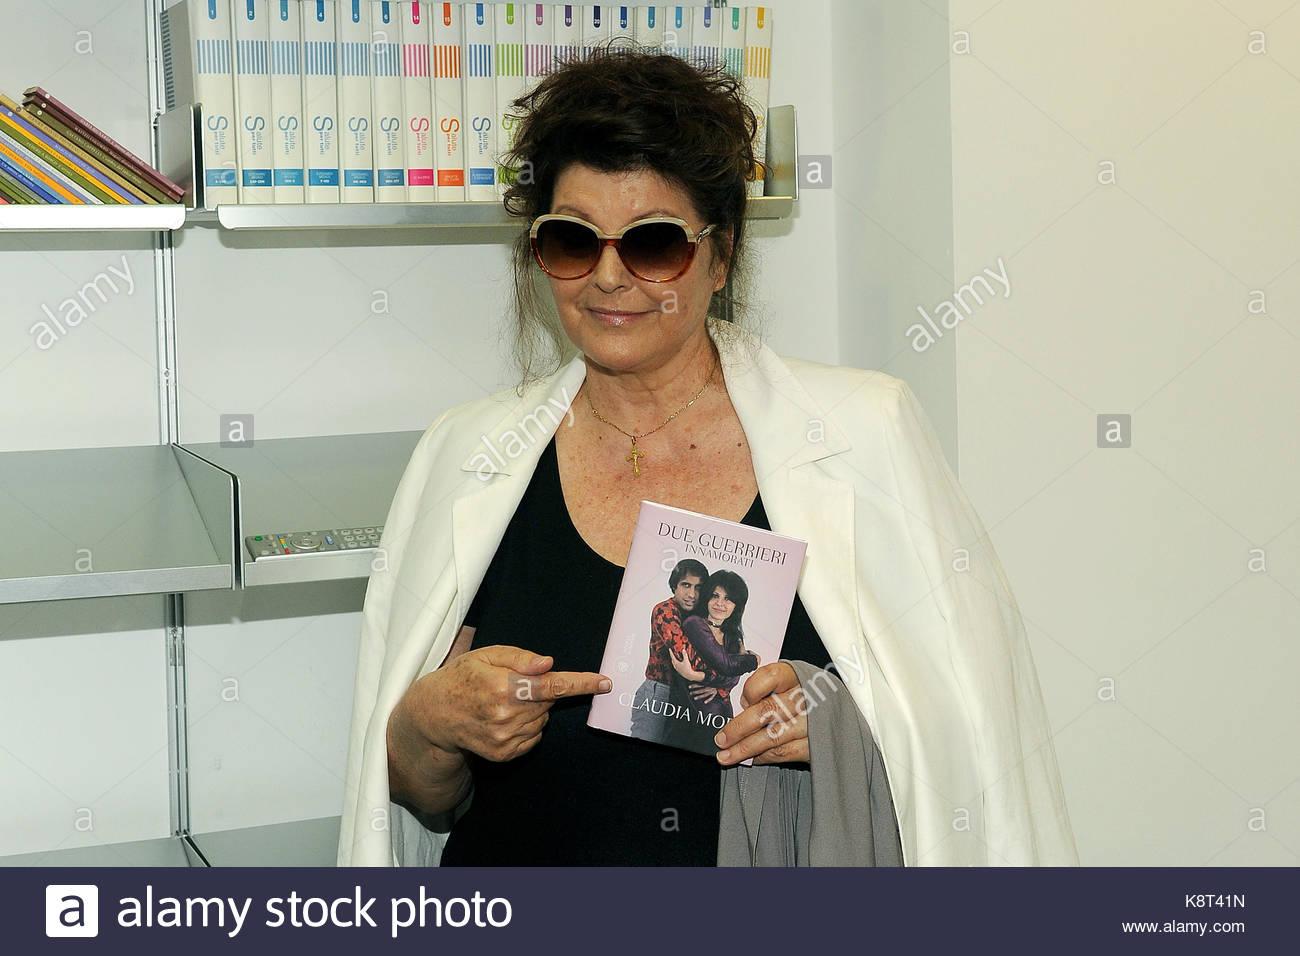 Claudia Mori. Claudia Mori at last day of  La Milanesiana 2014, presents his book' Due guerrieri innamorati', - Stock Image